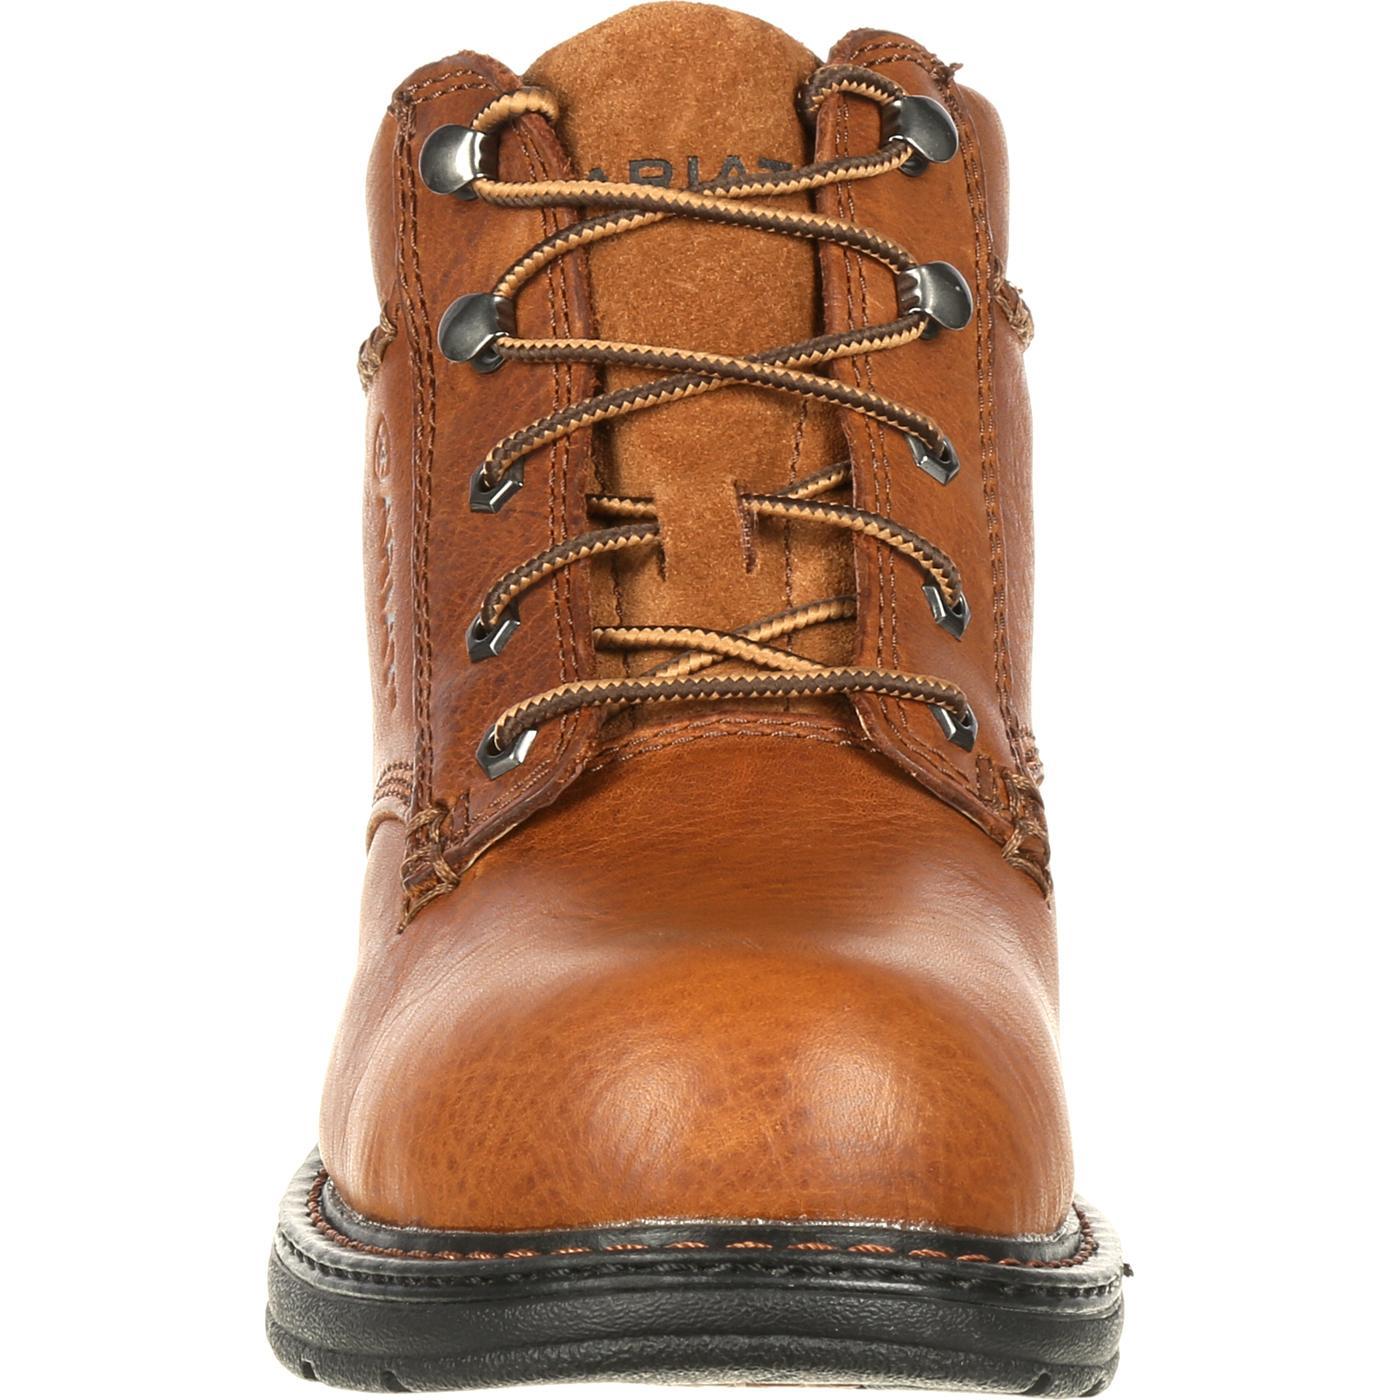 Ariat Women S Macey Composite Toe Hiking Work Boot 10005949